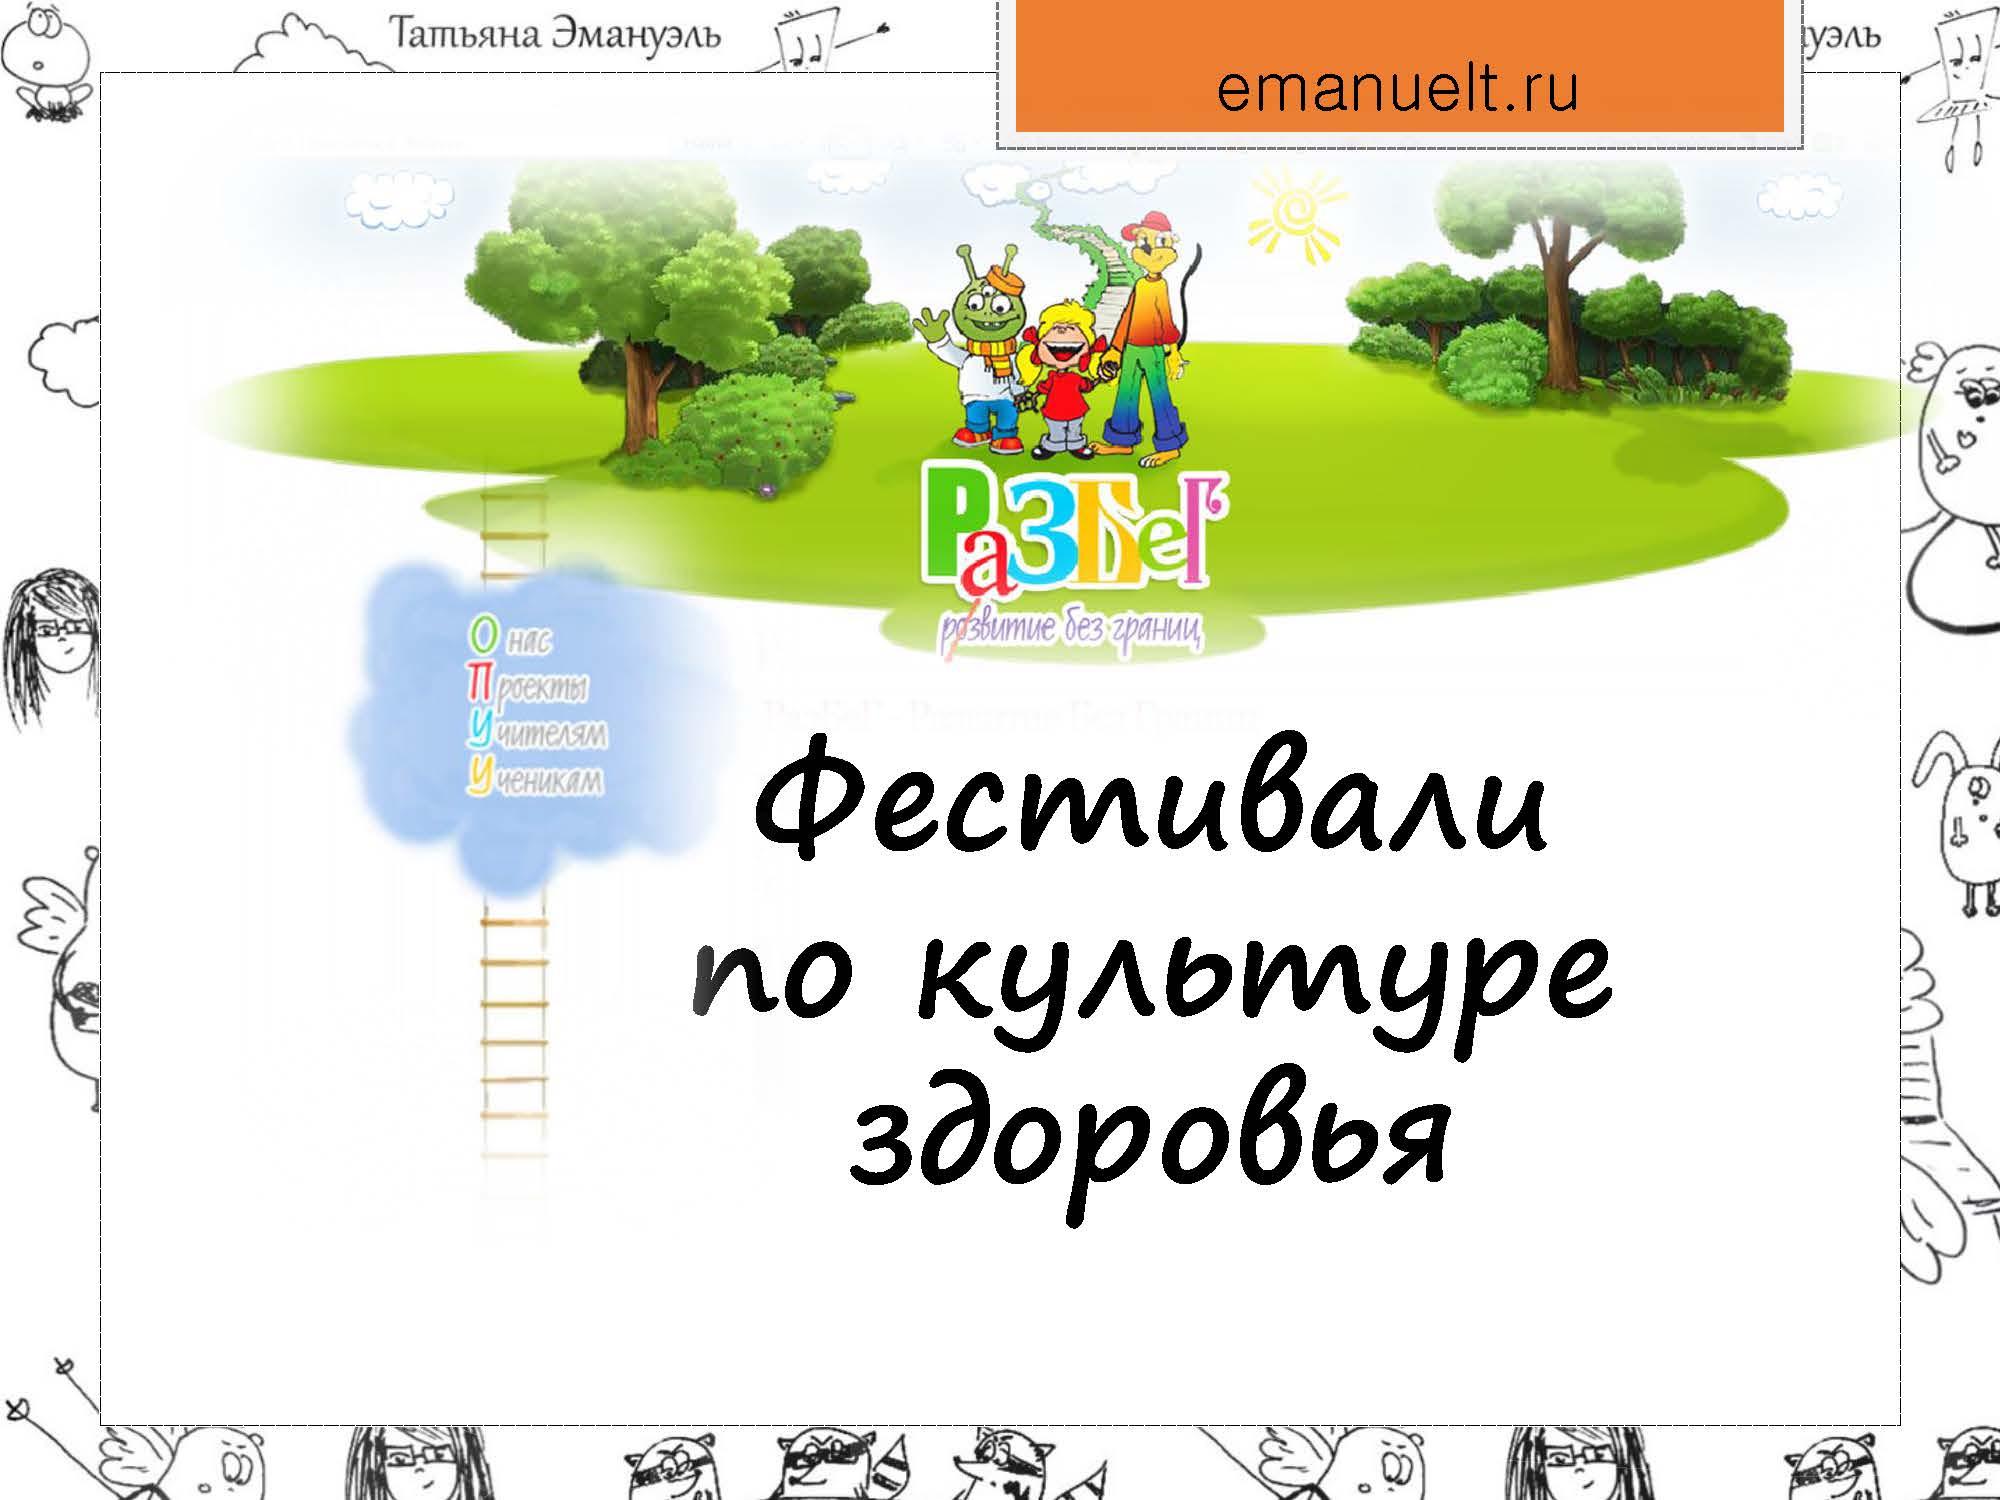 RazBeG_Emanuel_Страница_05